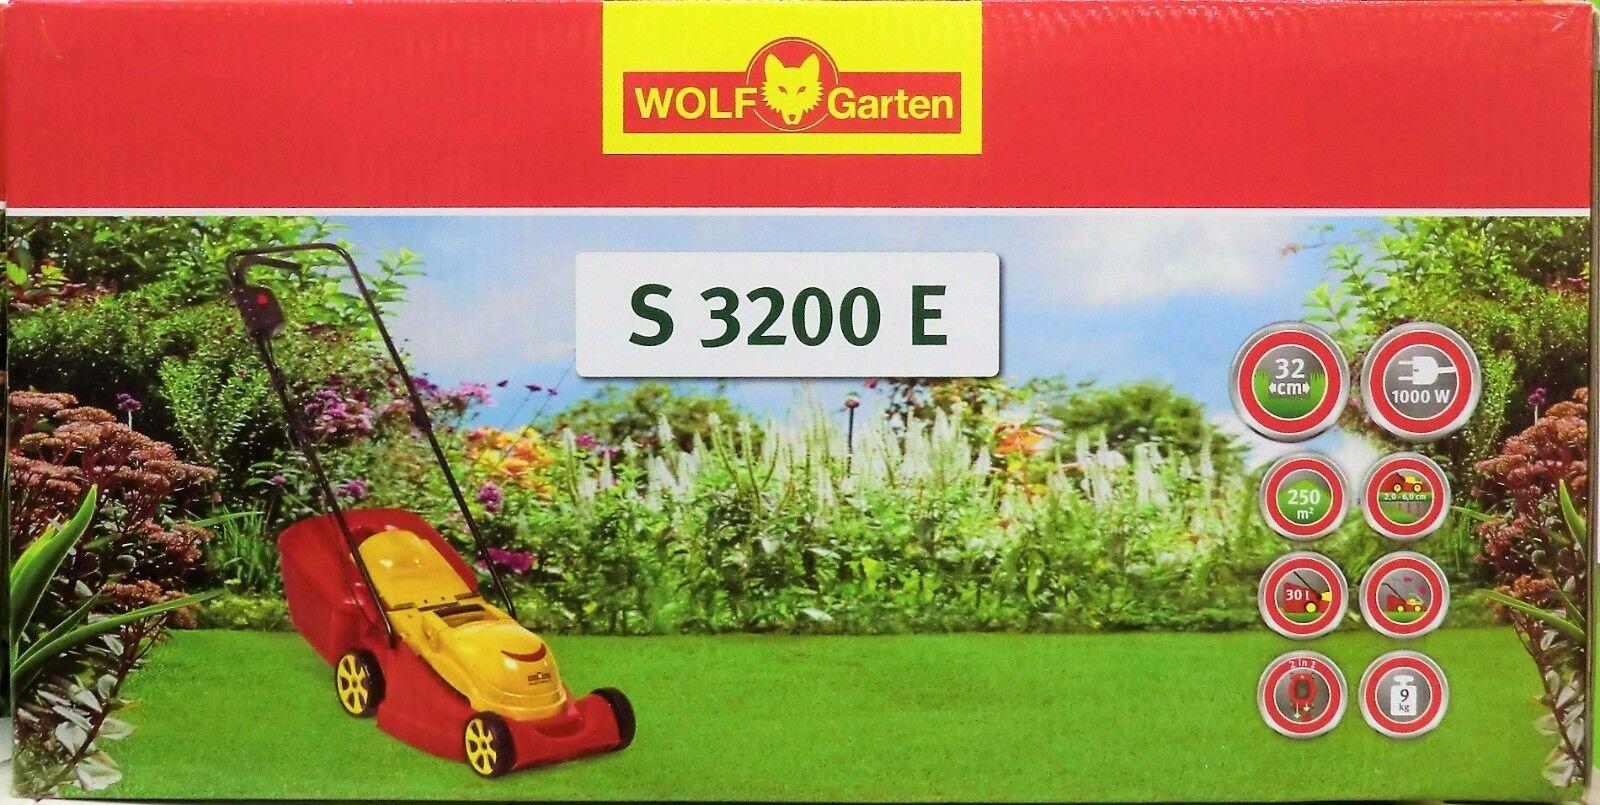 WOLF-Garten Elektro-Rasenmäher S 3200 E, Schnittbreite 32 cm, mit Fangkorb, NEU